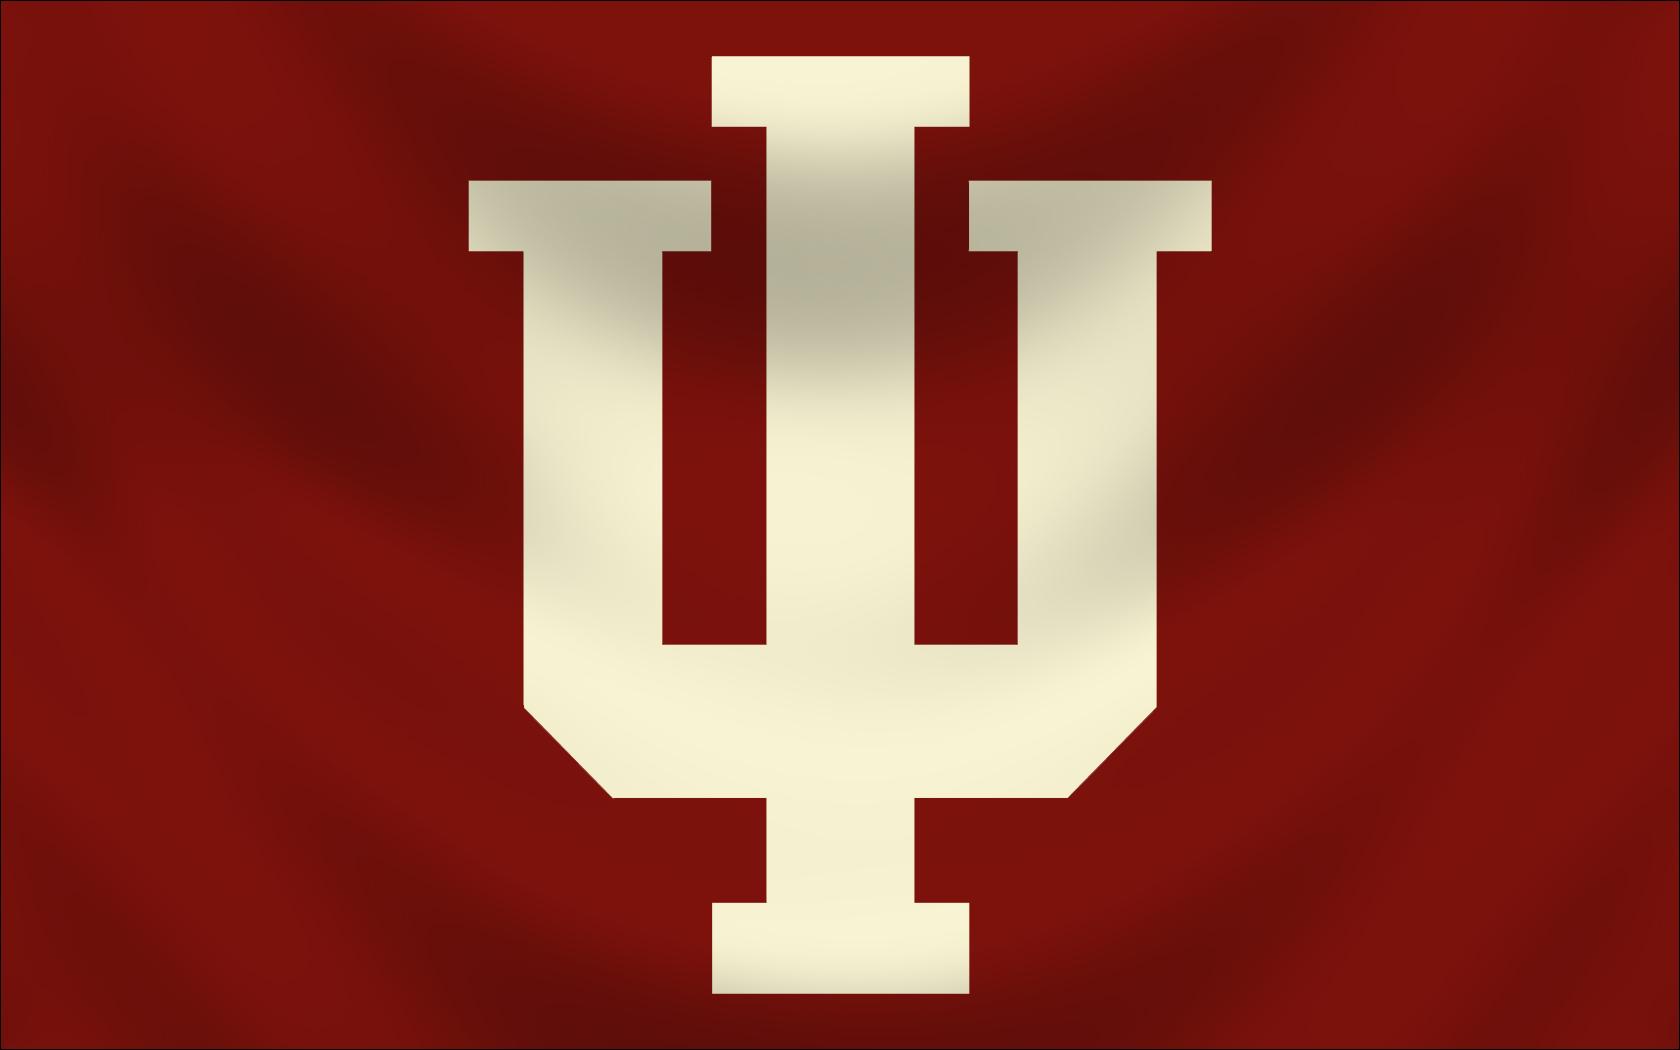 Indiana hoosiers wallpaper wallpapersafari - Indiana university logo wallpaper ...